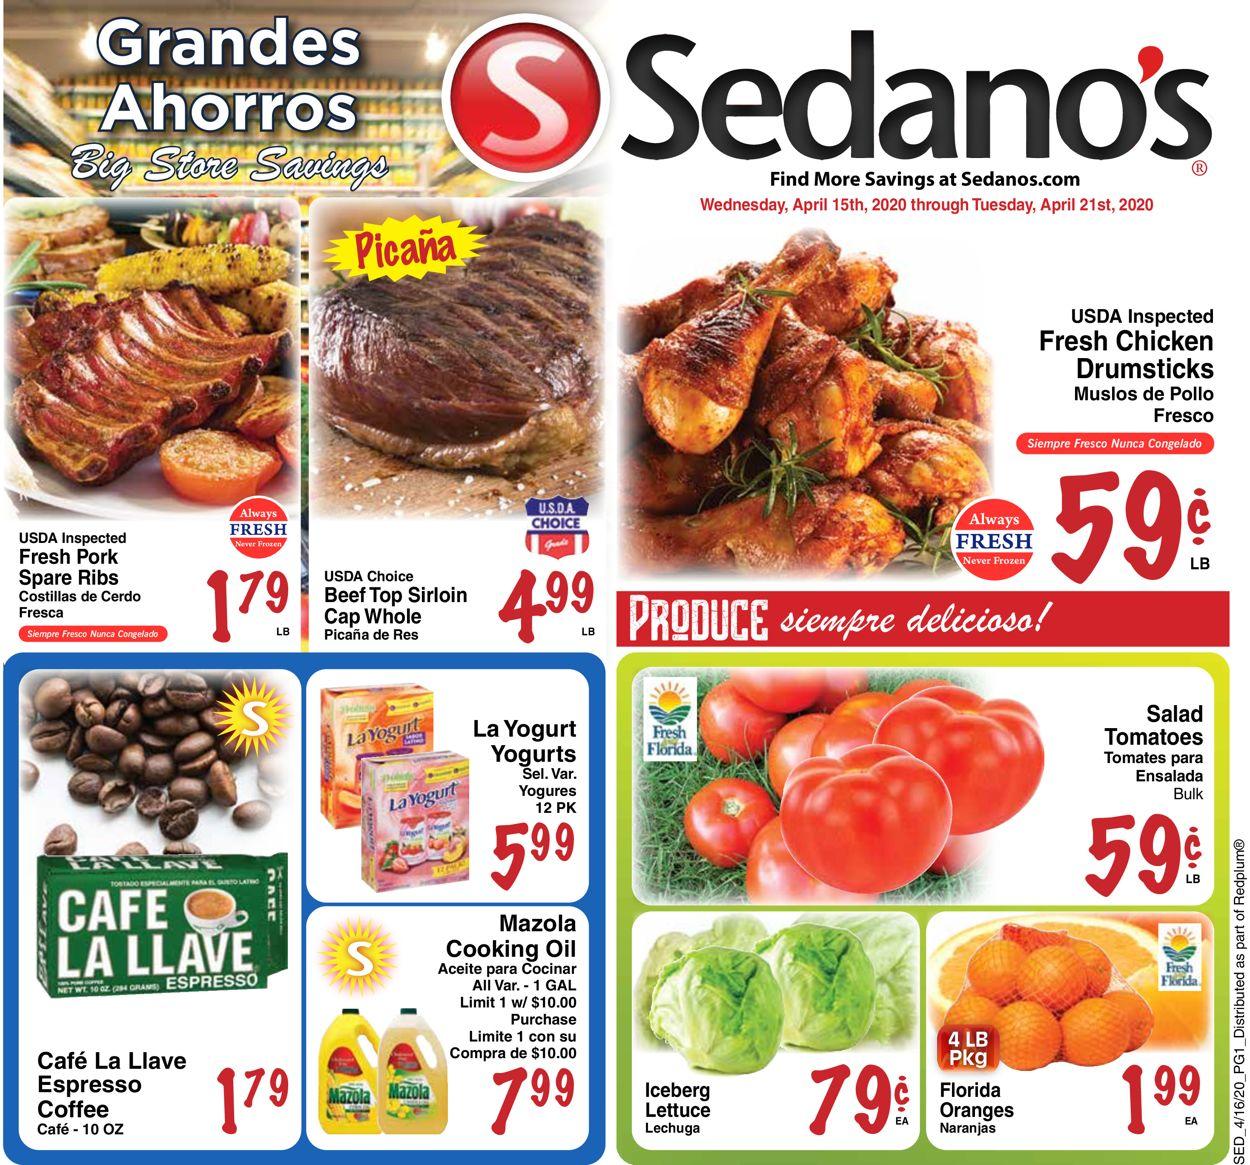 Sedano's Weekly Ad Circular - valid 04/15-04/21/2020